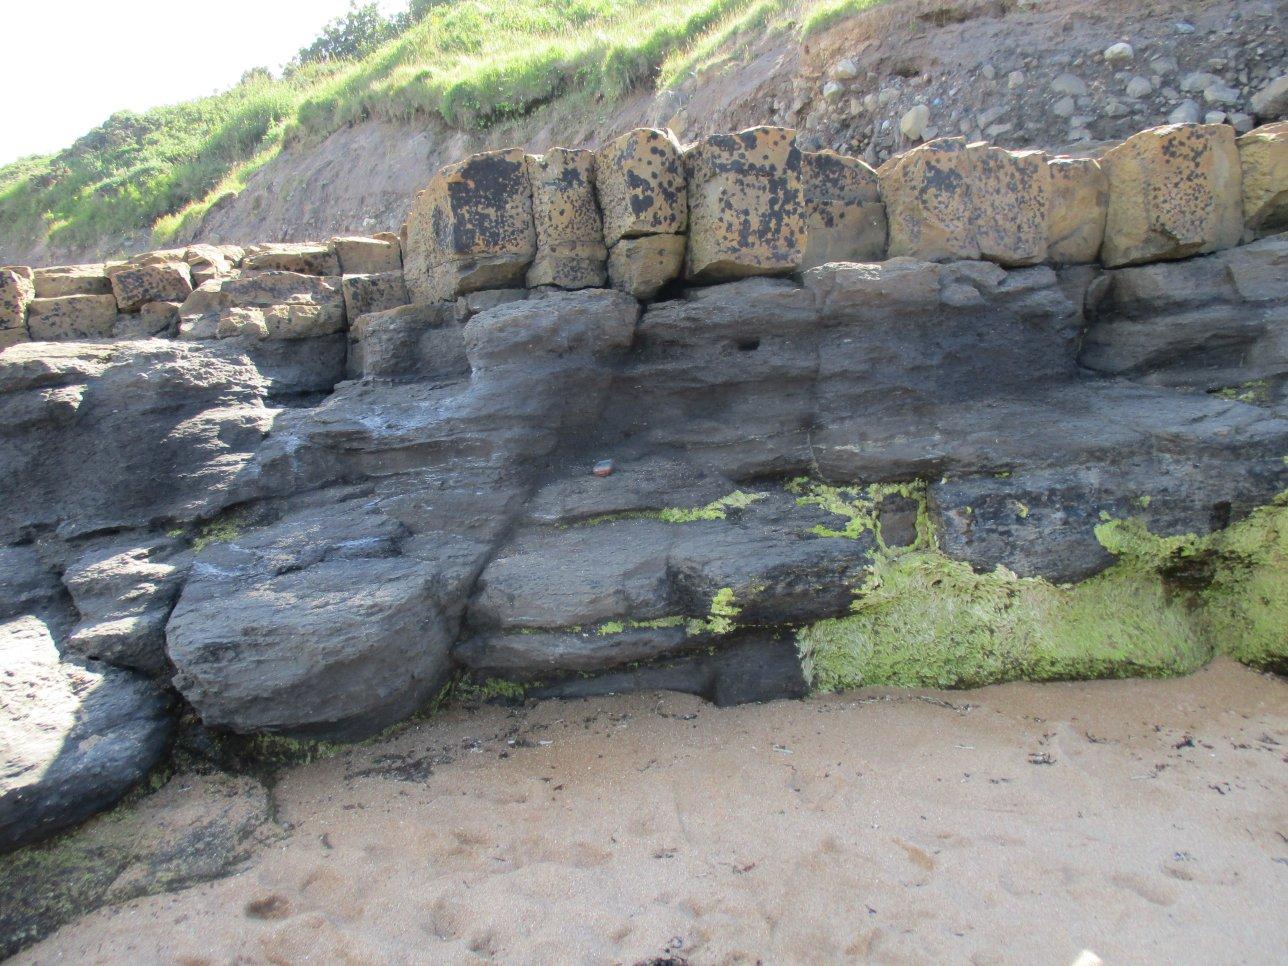 Blocks of limestone resting on shale.